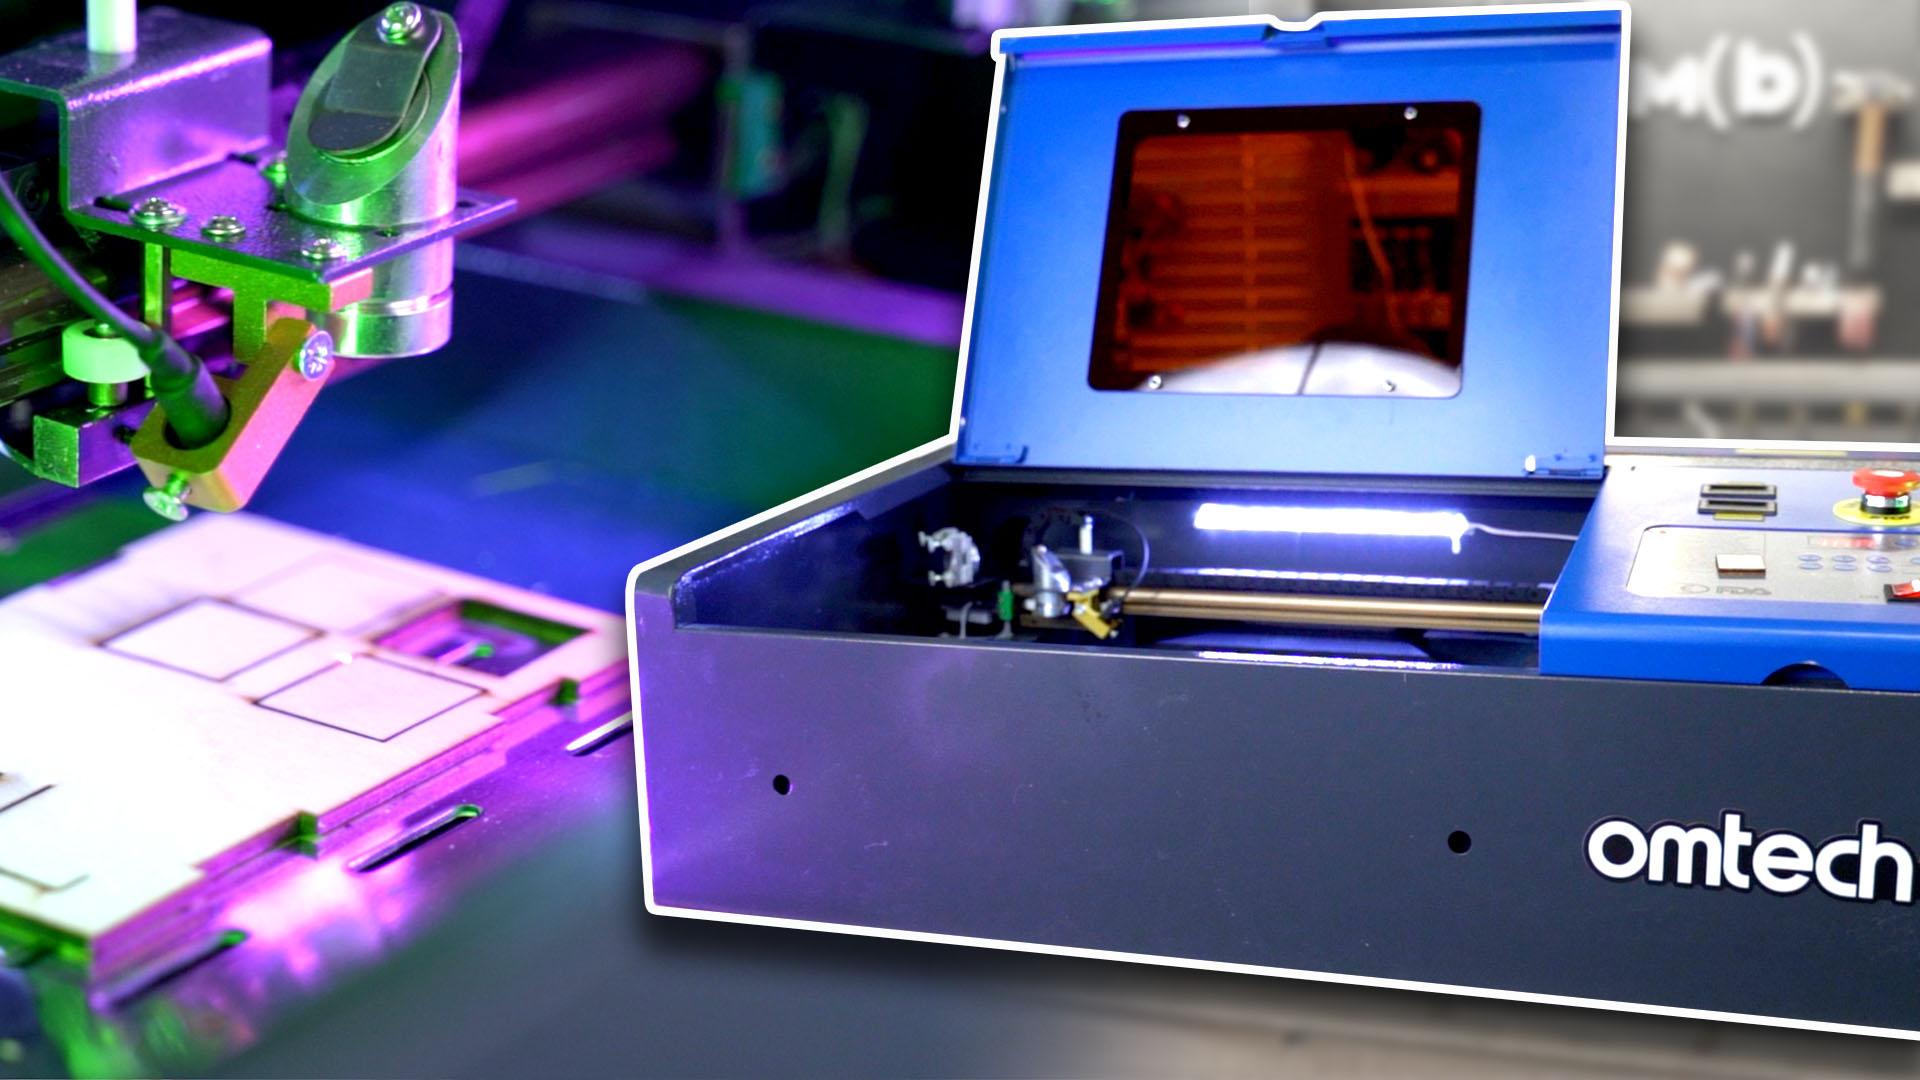 40W Laser Engraver & Cutter Review (K40)